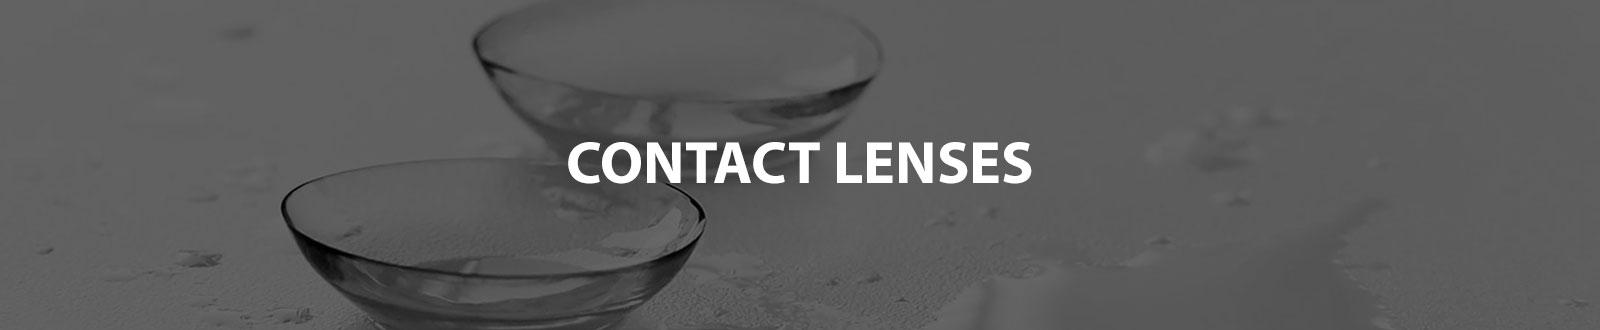 Contact-Lenses_02